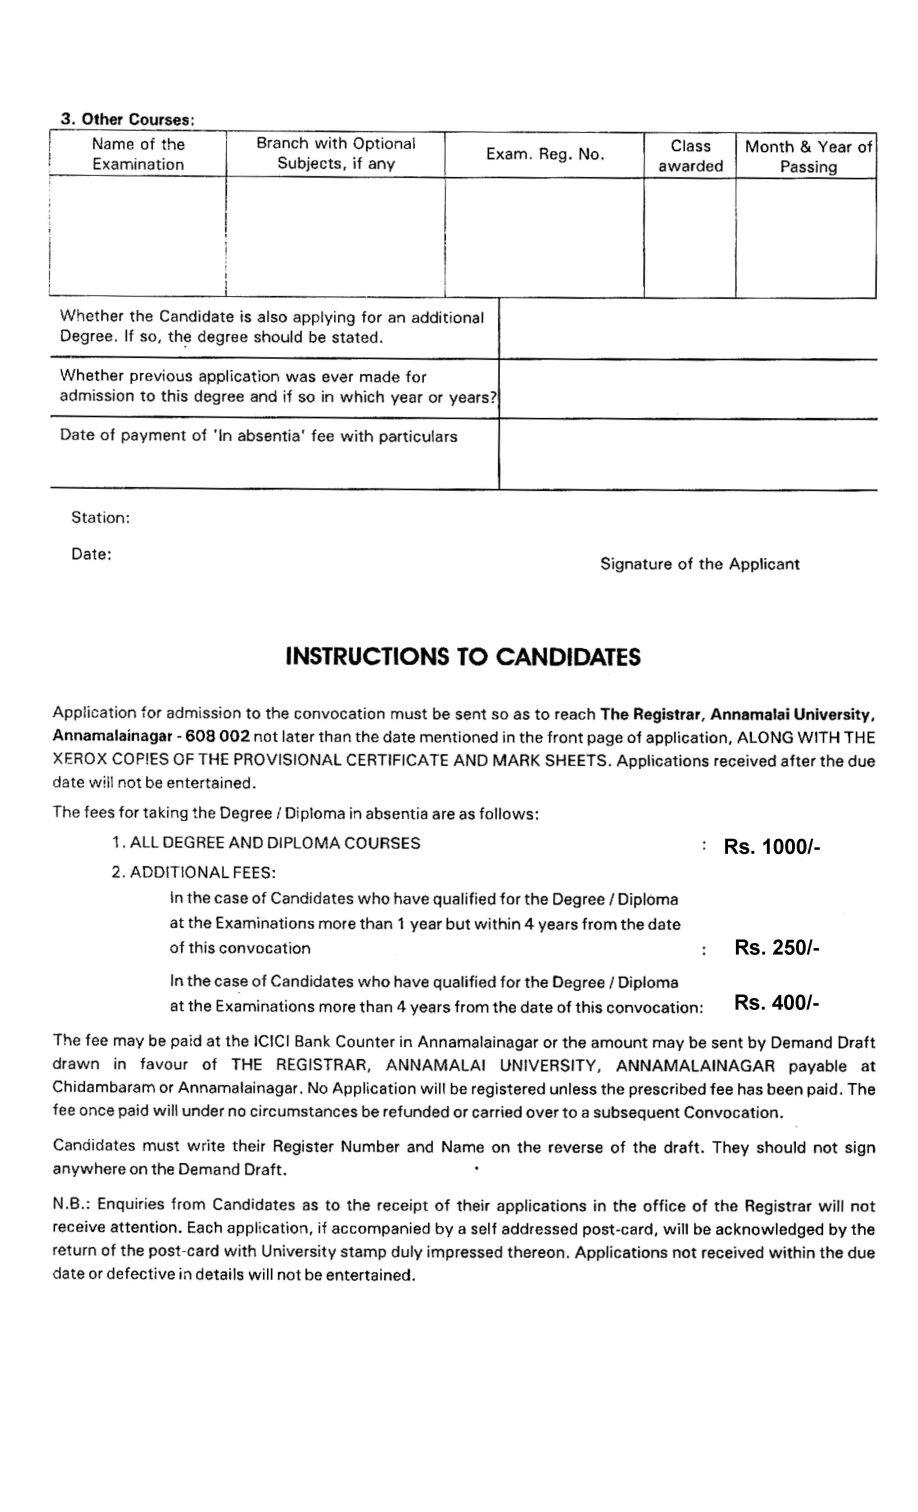 Annamalai-university-degree-certificate-form-2 Application Form For Degree Certificate Allahabad University on